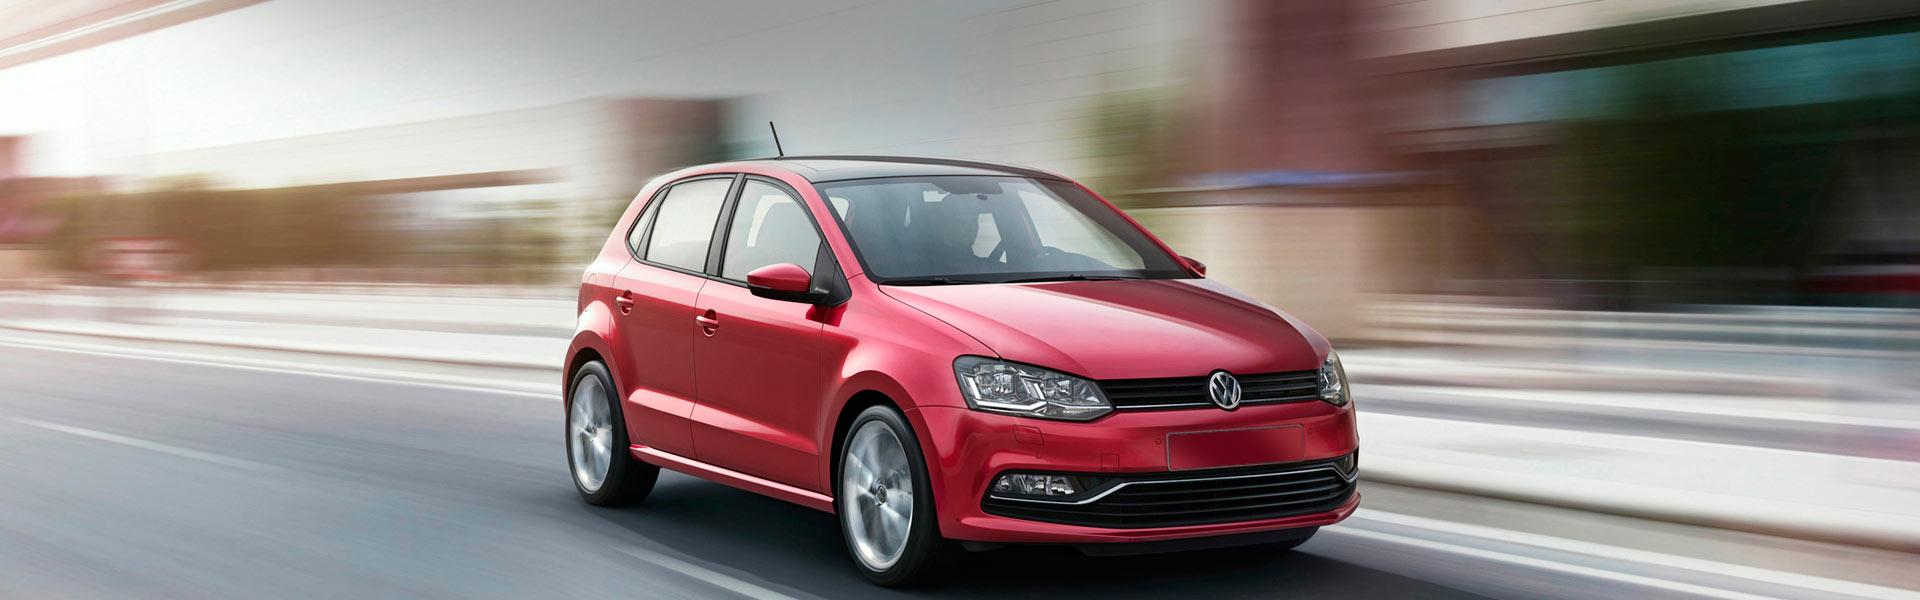 Кислородный датчик на Volkswagen Polo